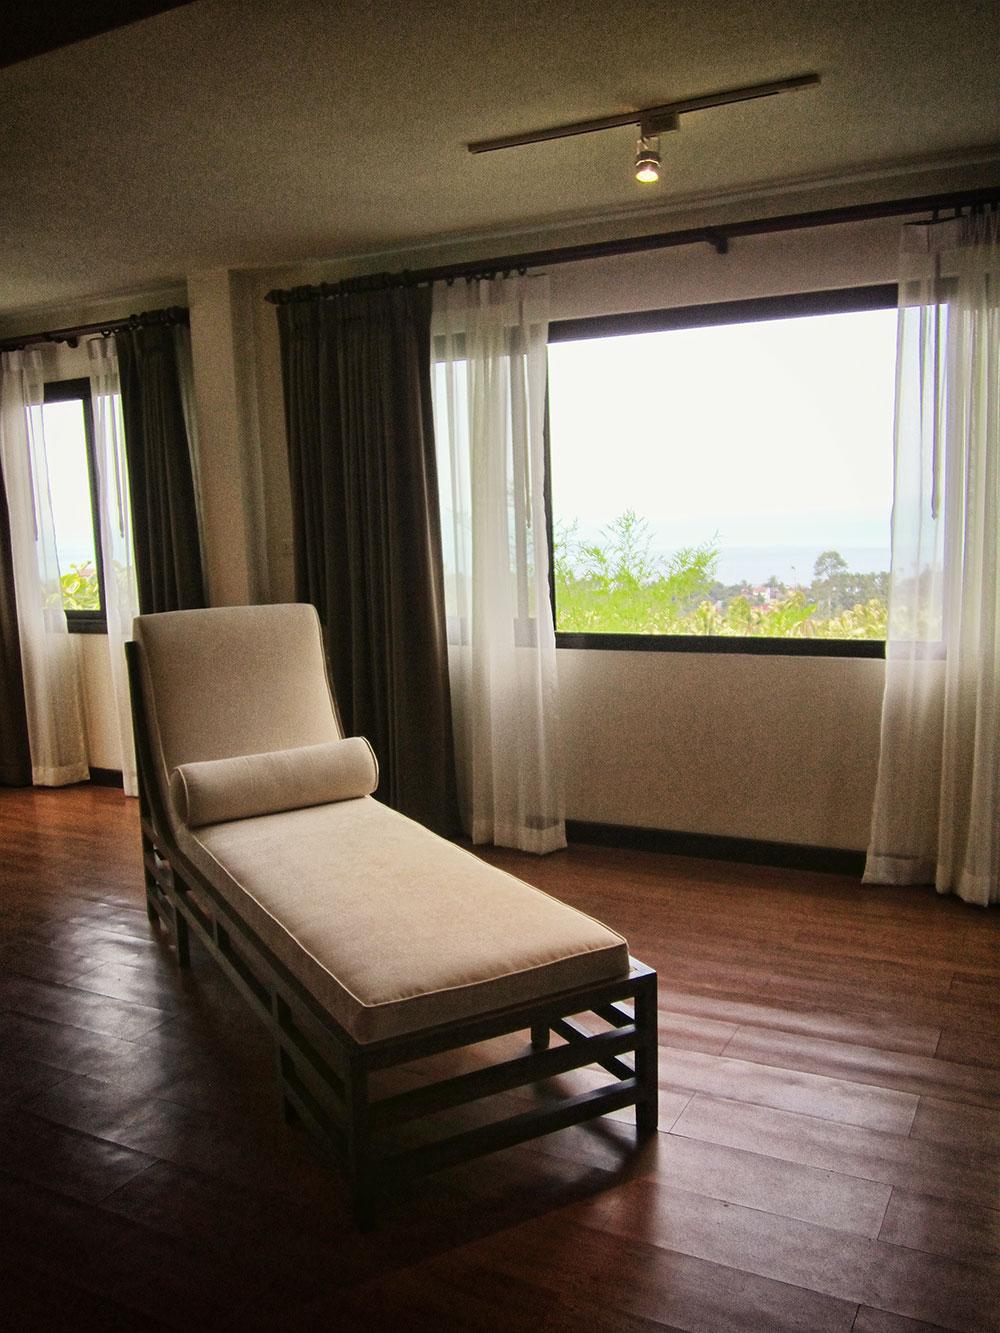 RE/MAX Island Real Estate Agency's 4 bedroom villa for rent in Bang Por, Ko Samui  10